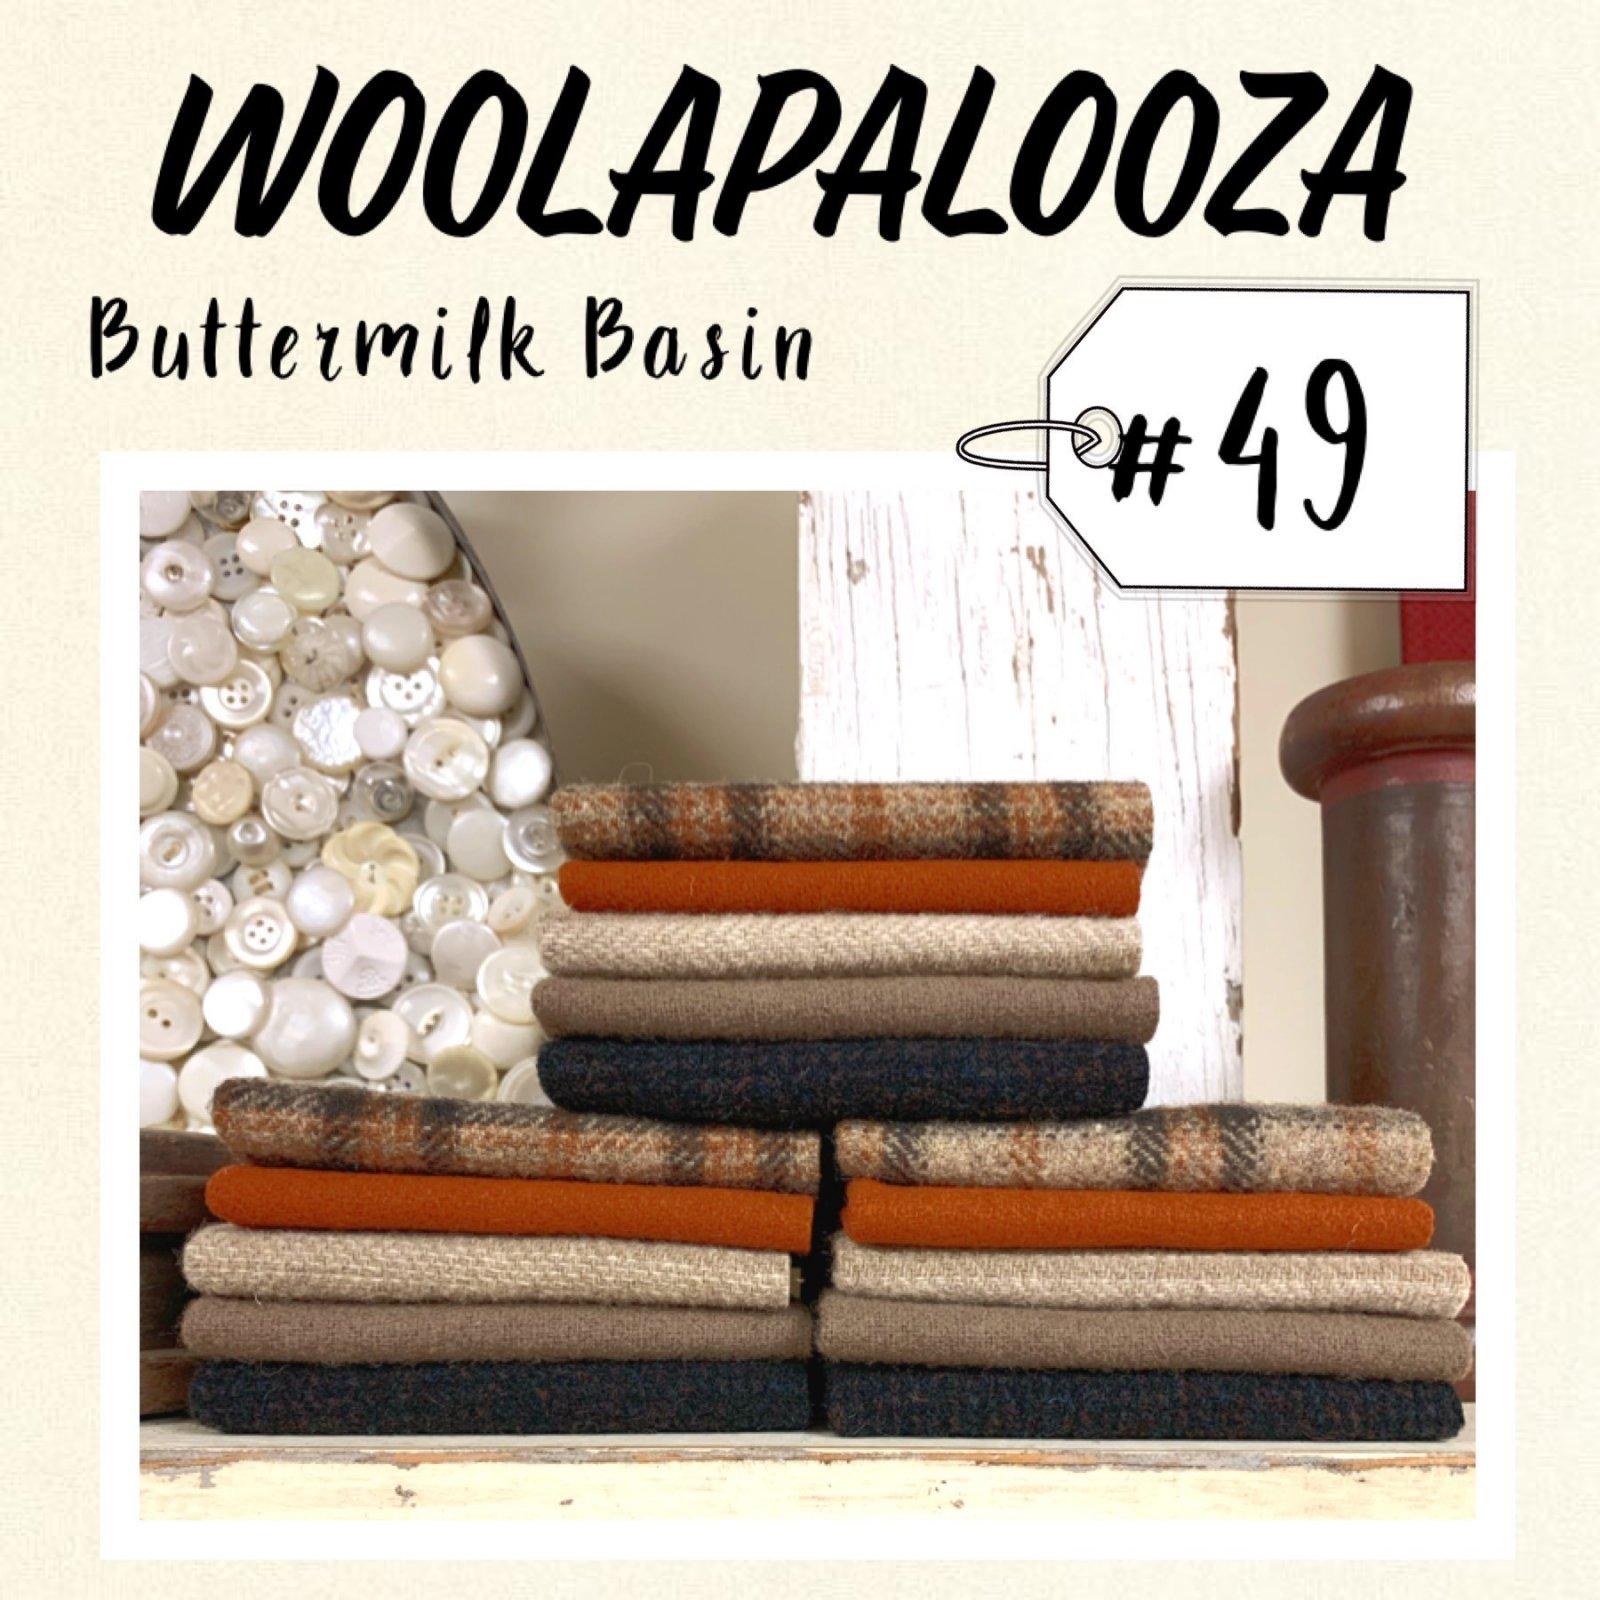 Woolapalooza #49 Wool Bundle